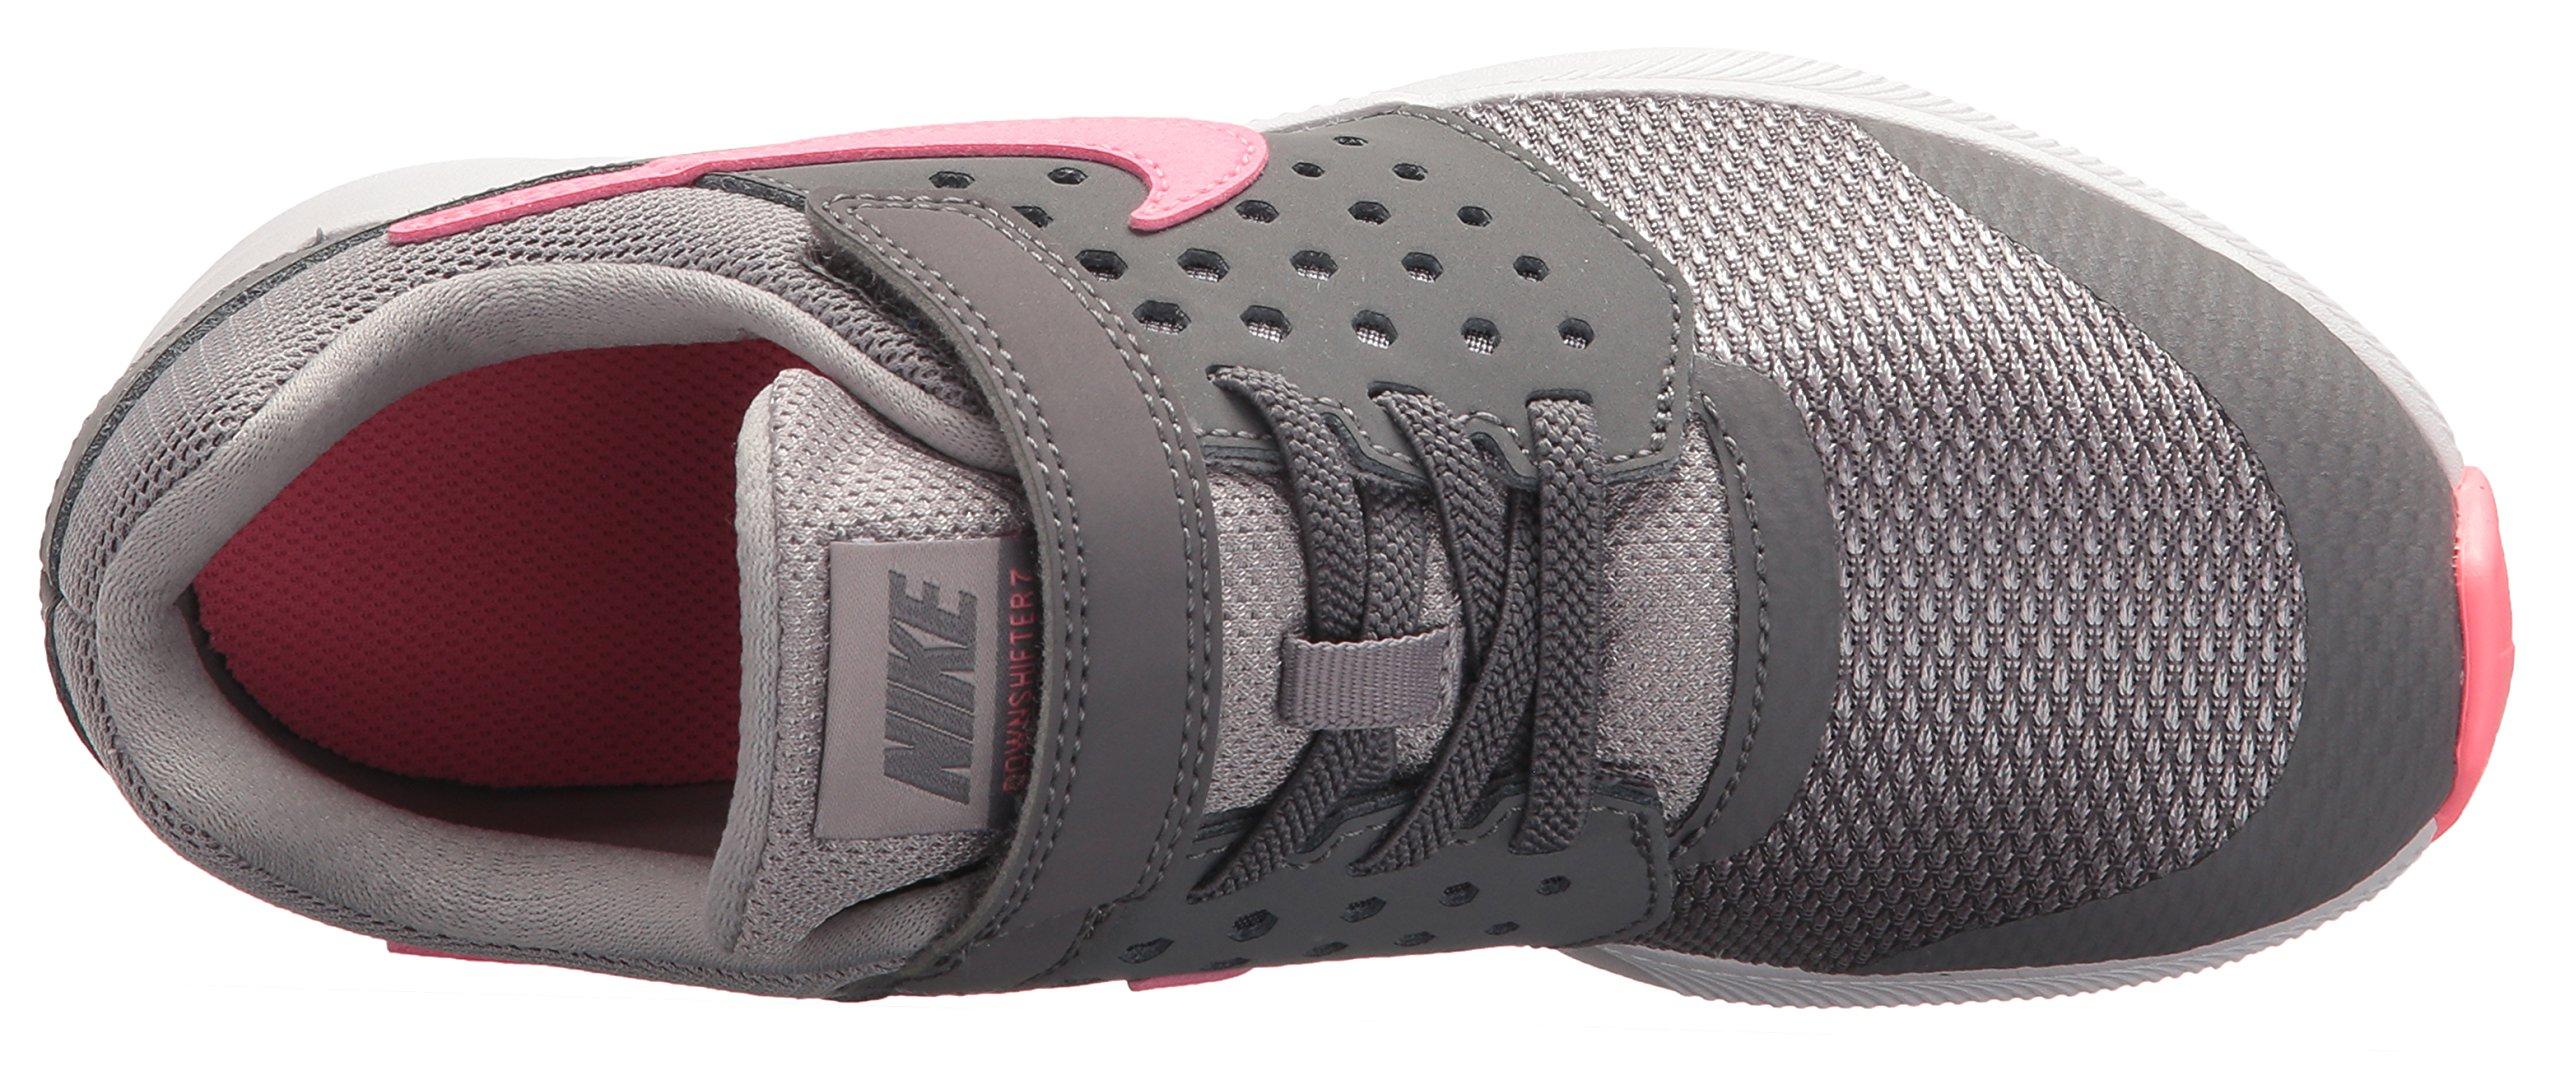 Nike Girls' Downshifter 7 (PSV) Running Shoe, Gunsmoke/Sunset Pulse-Atmosphere Grey, 2 M US Little Kid by Nike (Image #8)